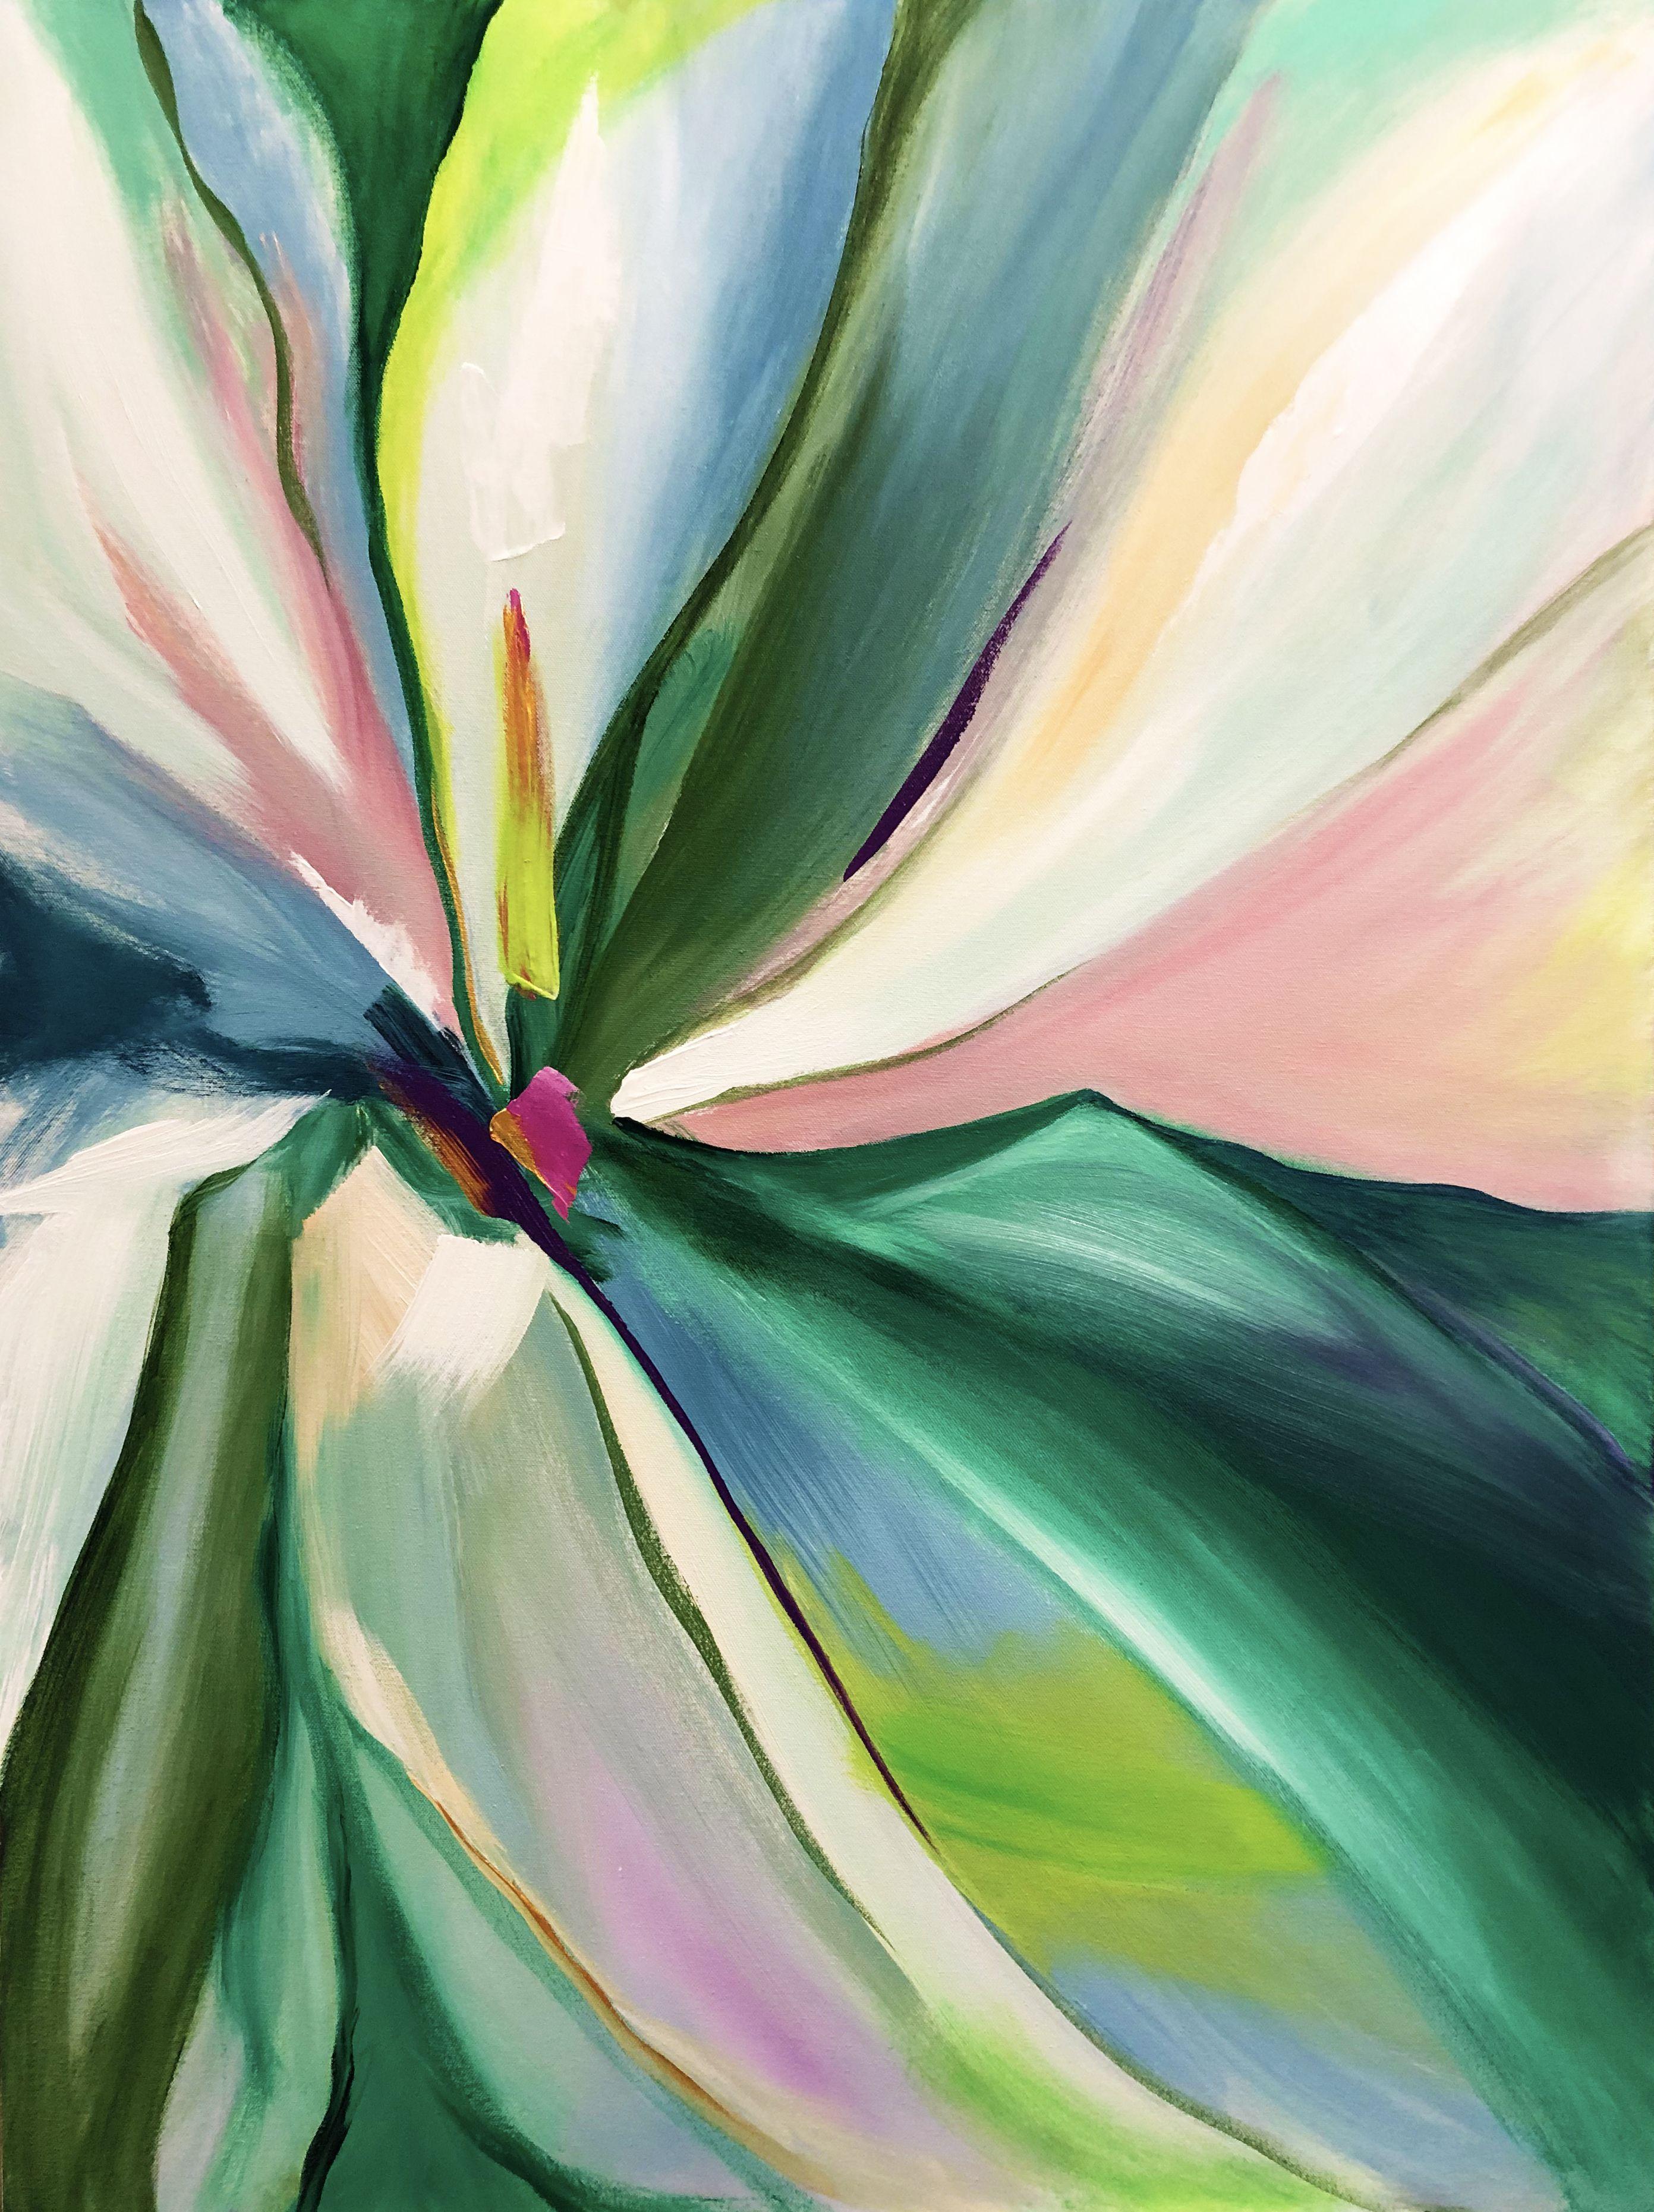 Abstract Flower Art - Cianelli Studios Art Blog